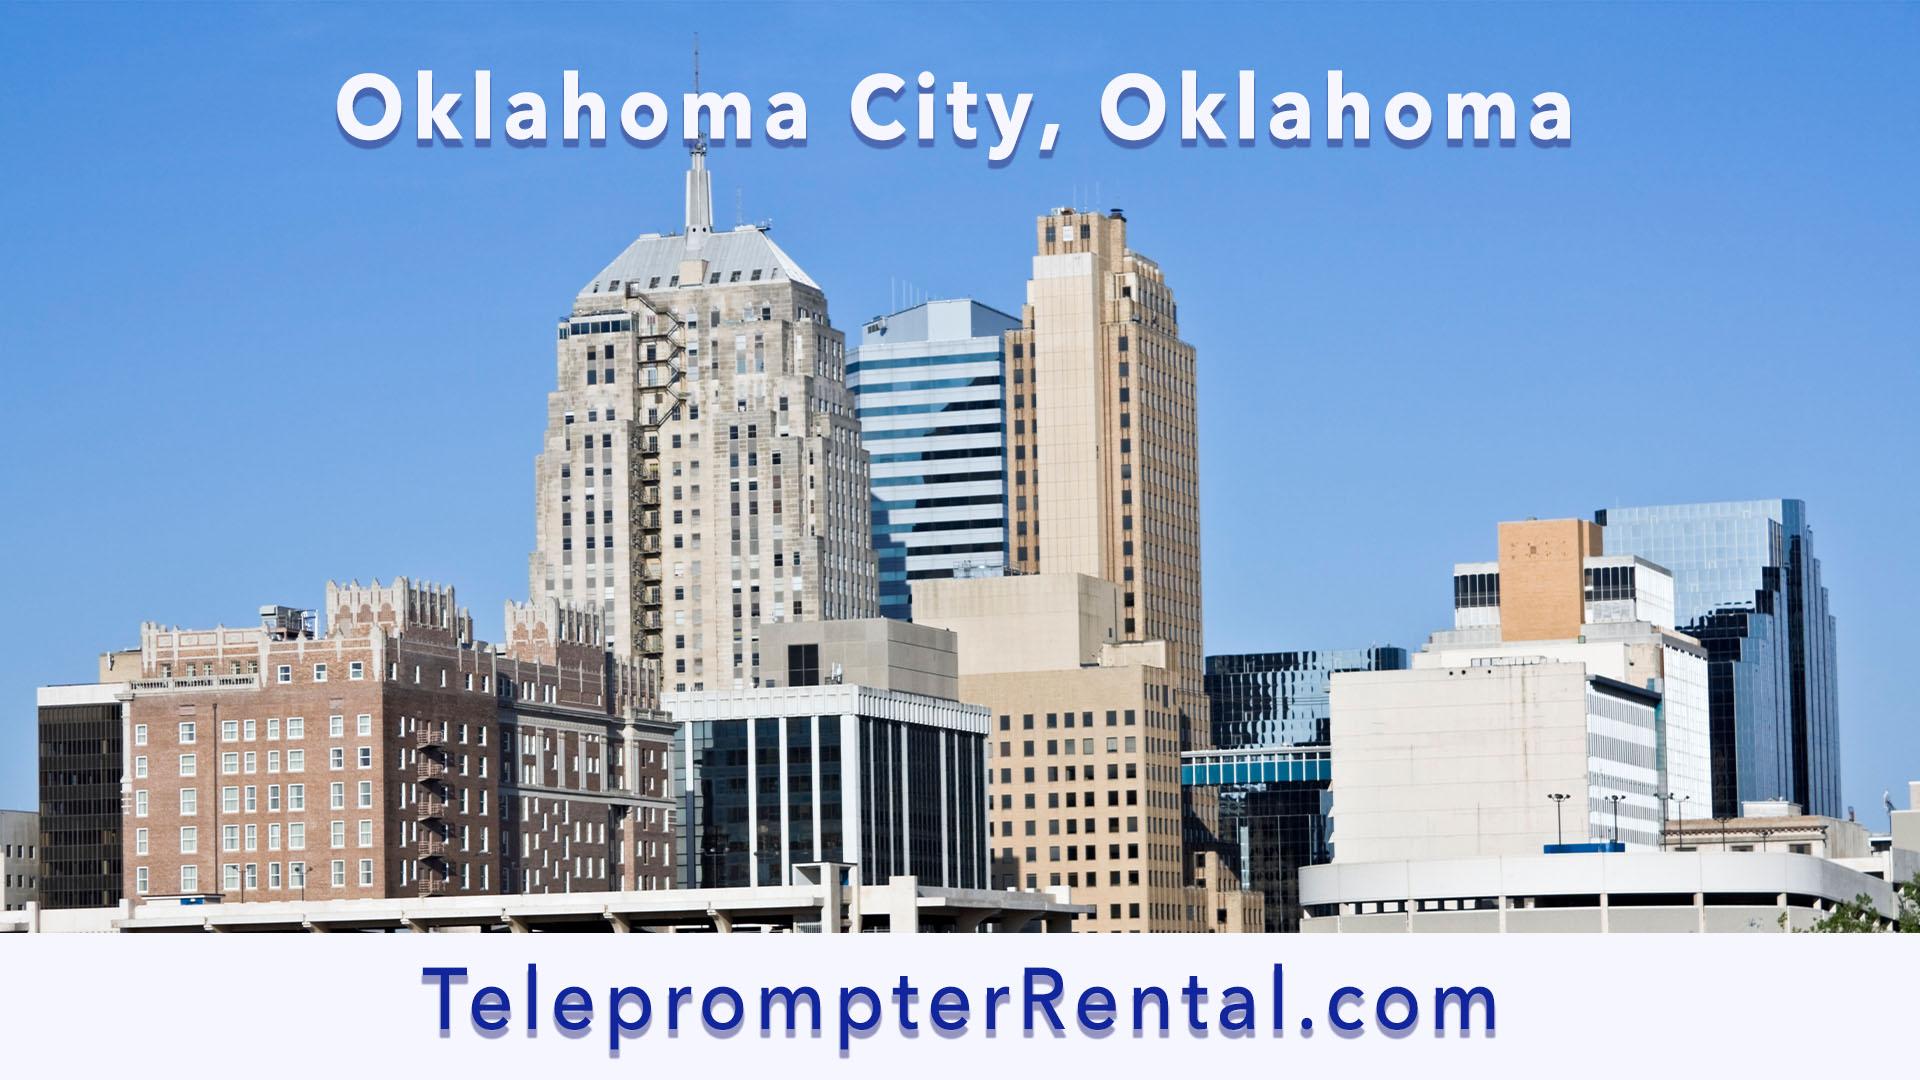 Oklahoma City, Oklahoma - Teleprompter Rental